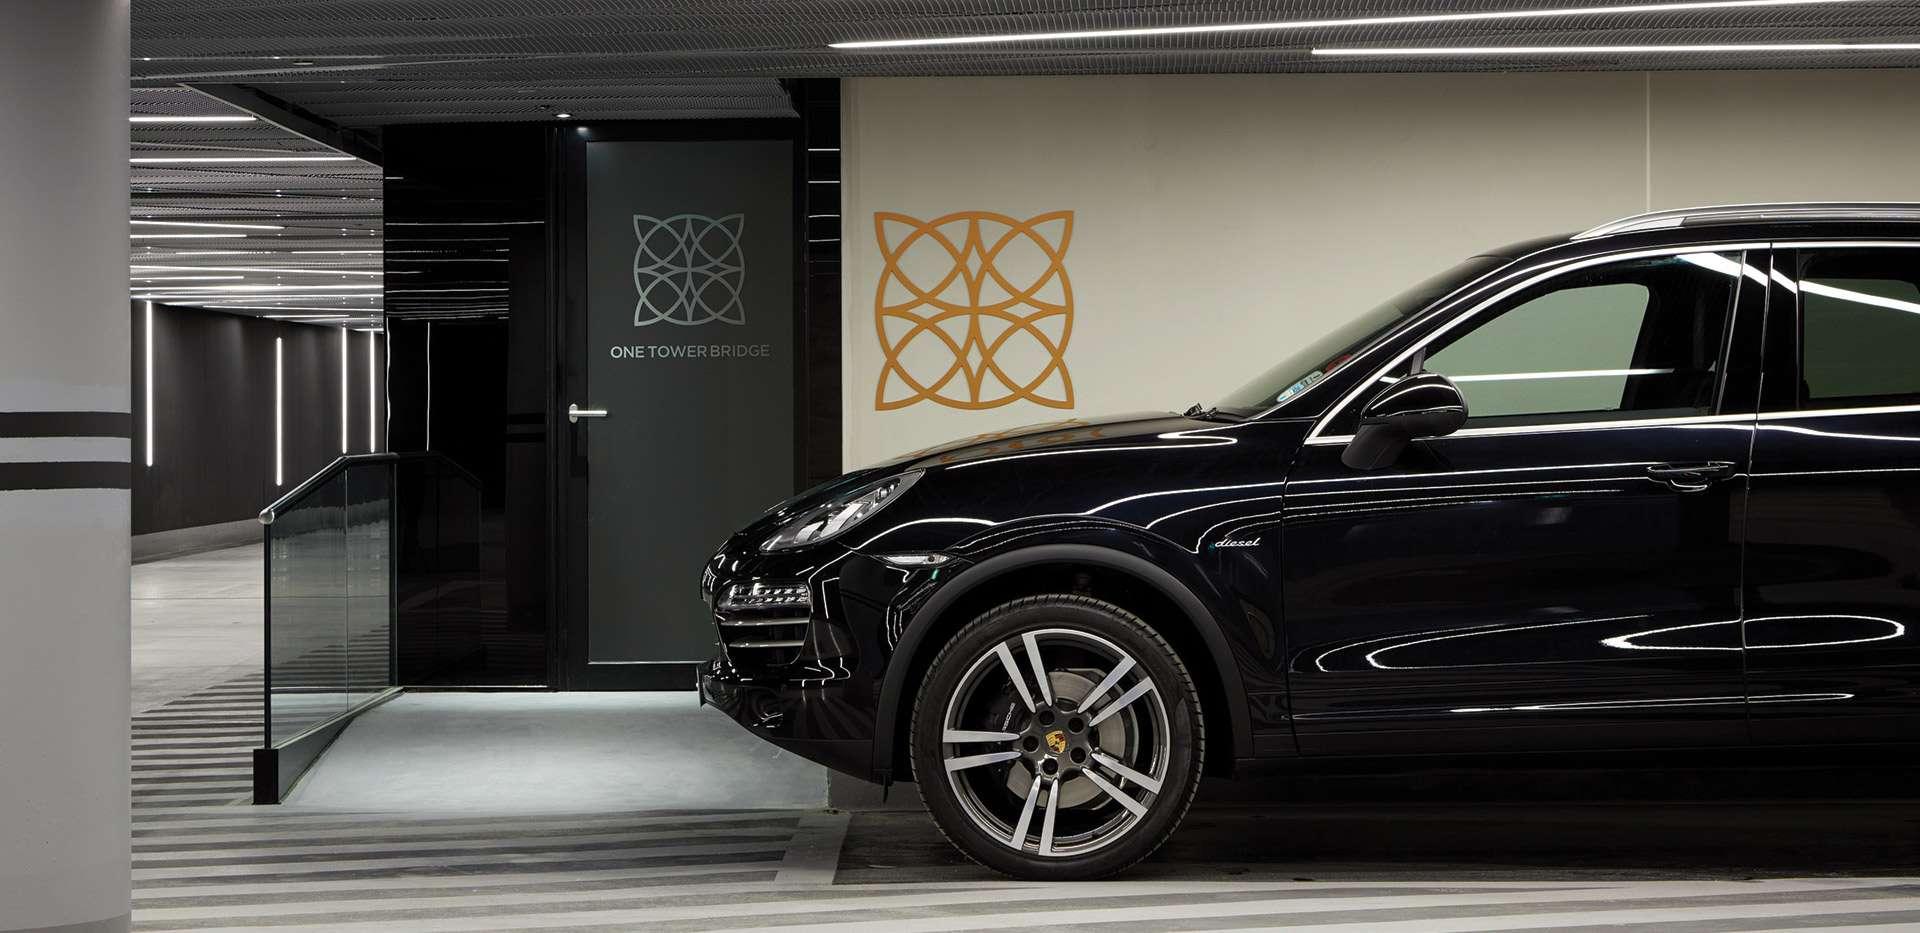 OTB garage